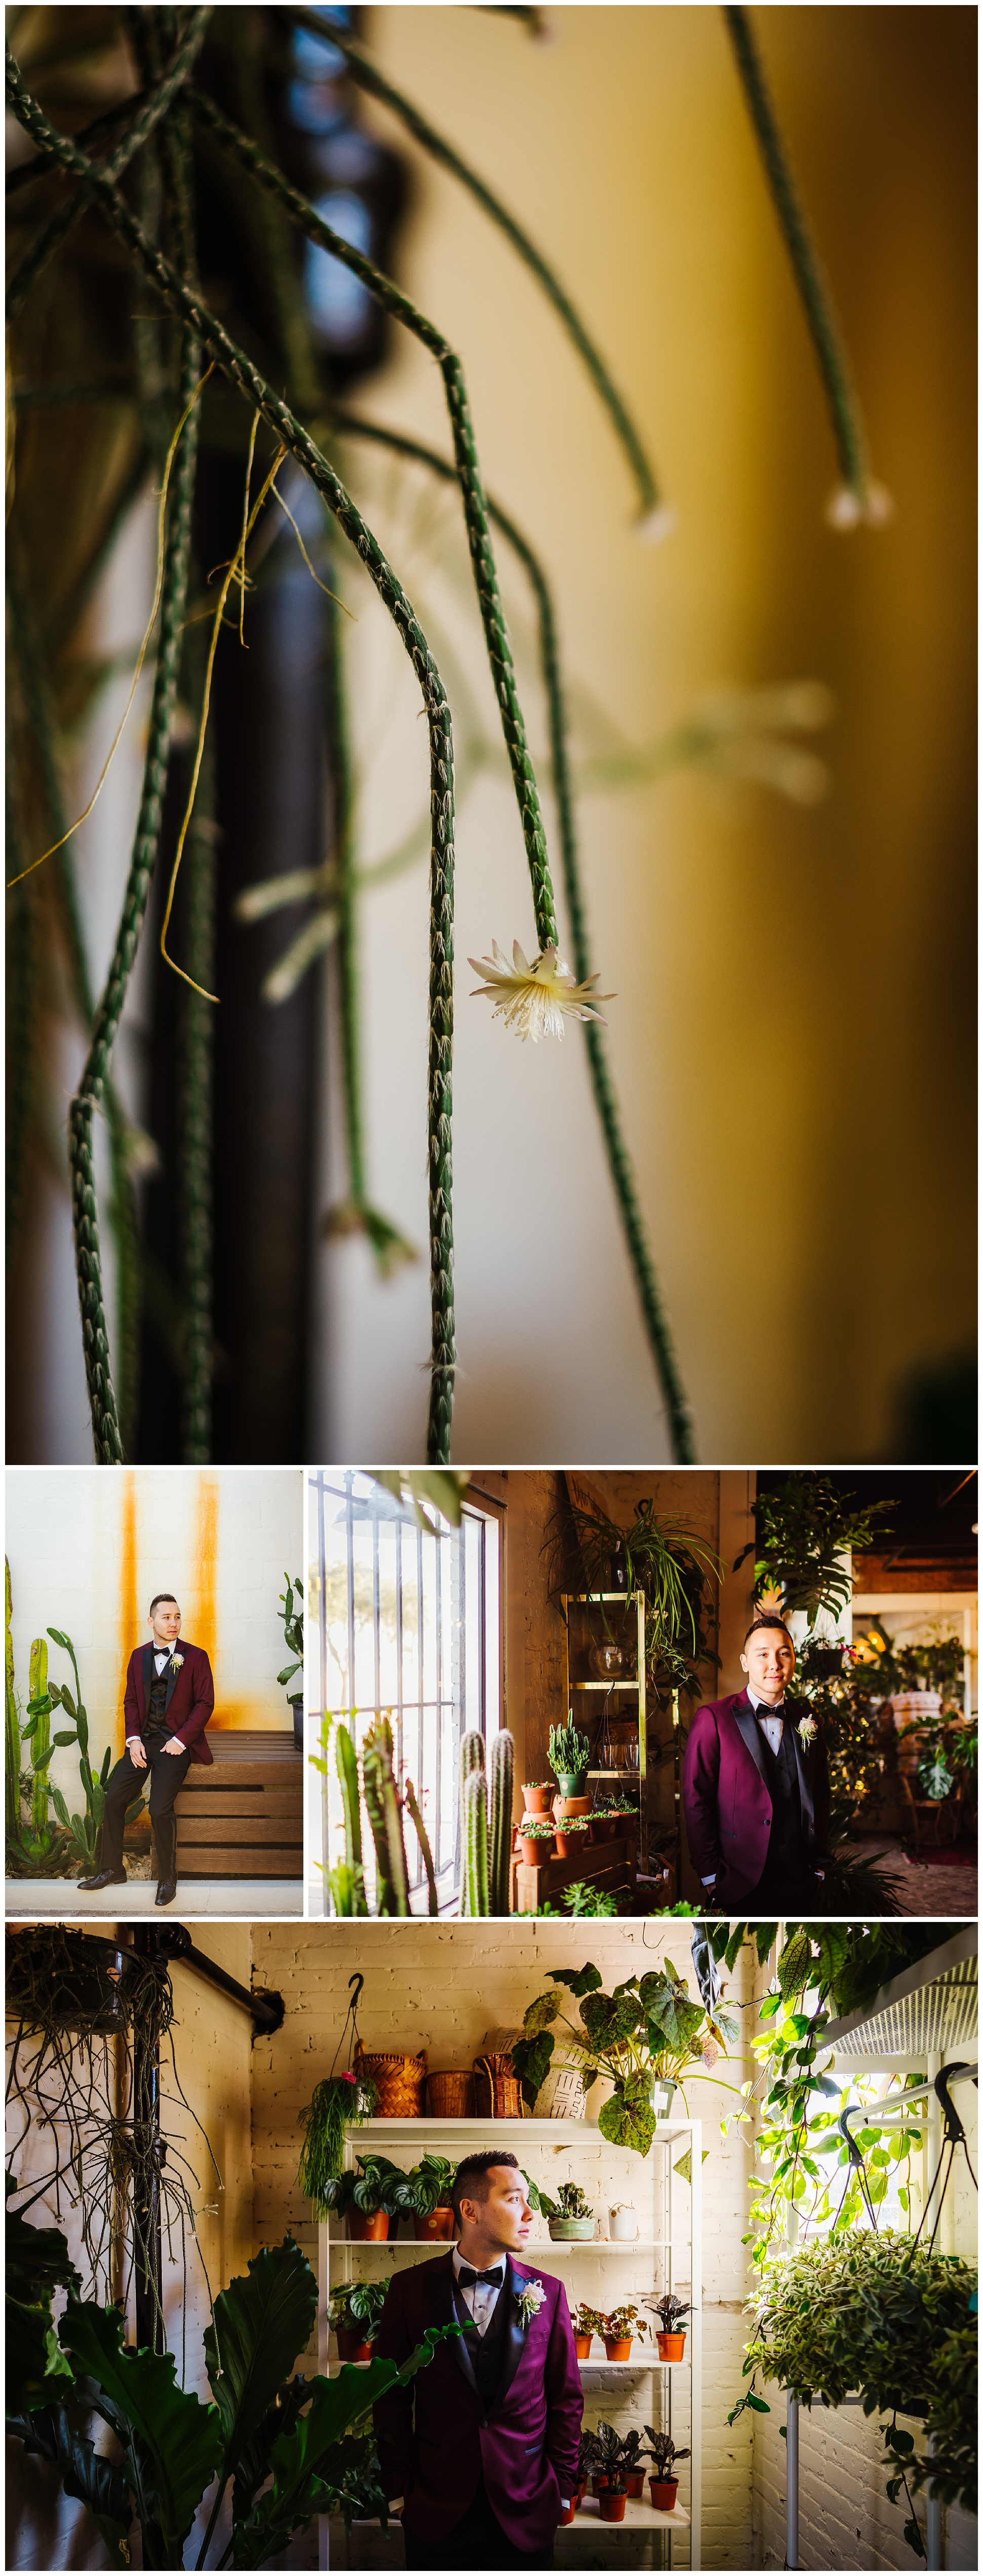 tampa-armeture-wedding-photographer-edgy-industrial-downtown-fancy-free-nursery-tattoo-burgandy-velvet_0026.jpg